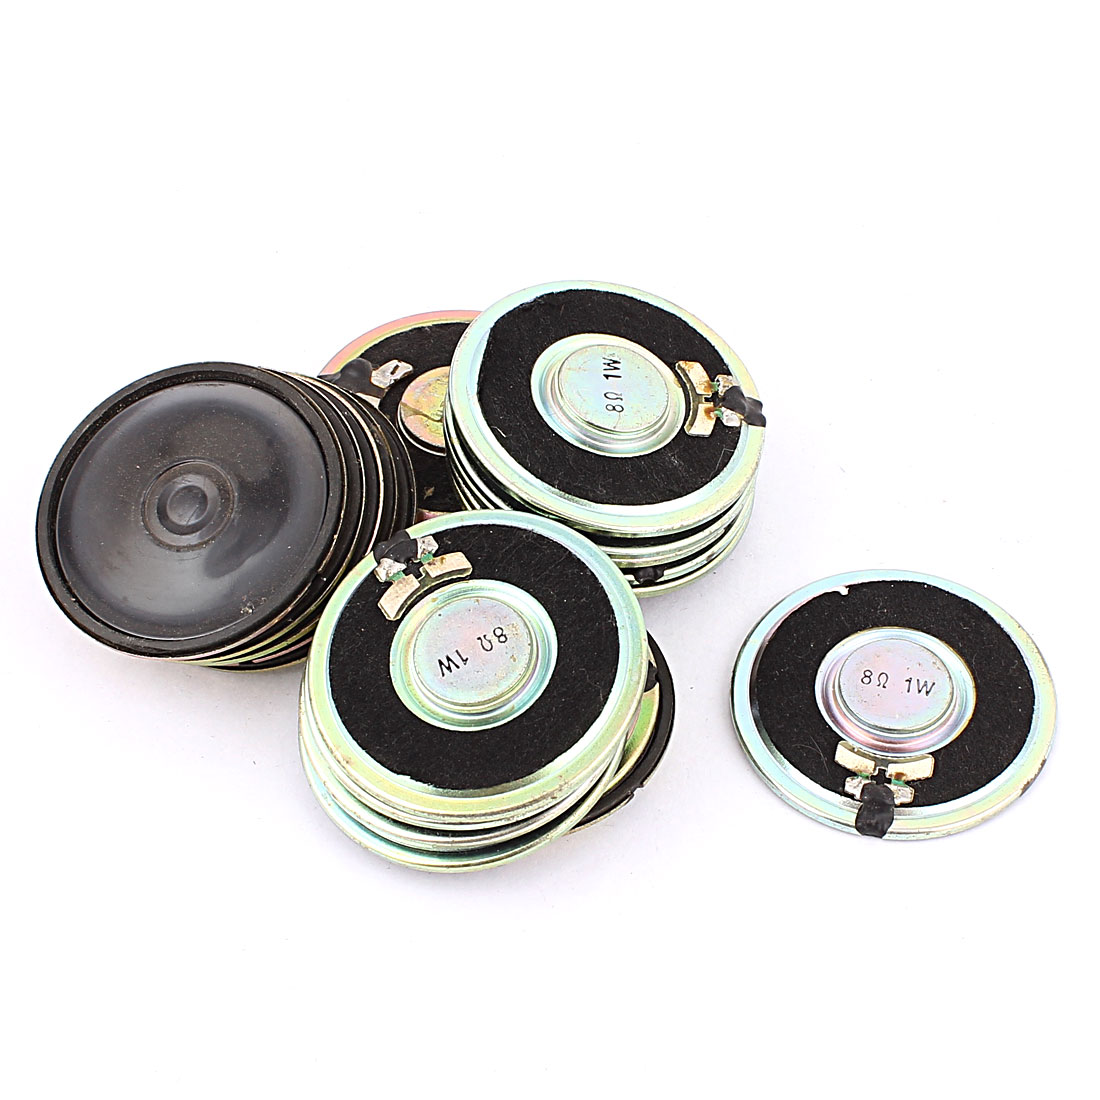 20 Pcs 45mm 8 Ohm 1W Metal External Magnetic Speaker Loudspeaker Silver Tone